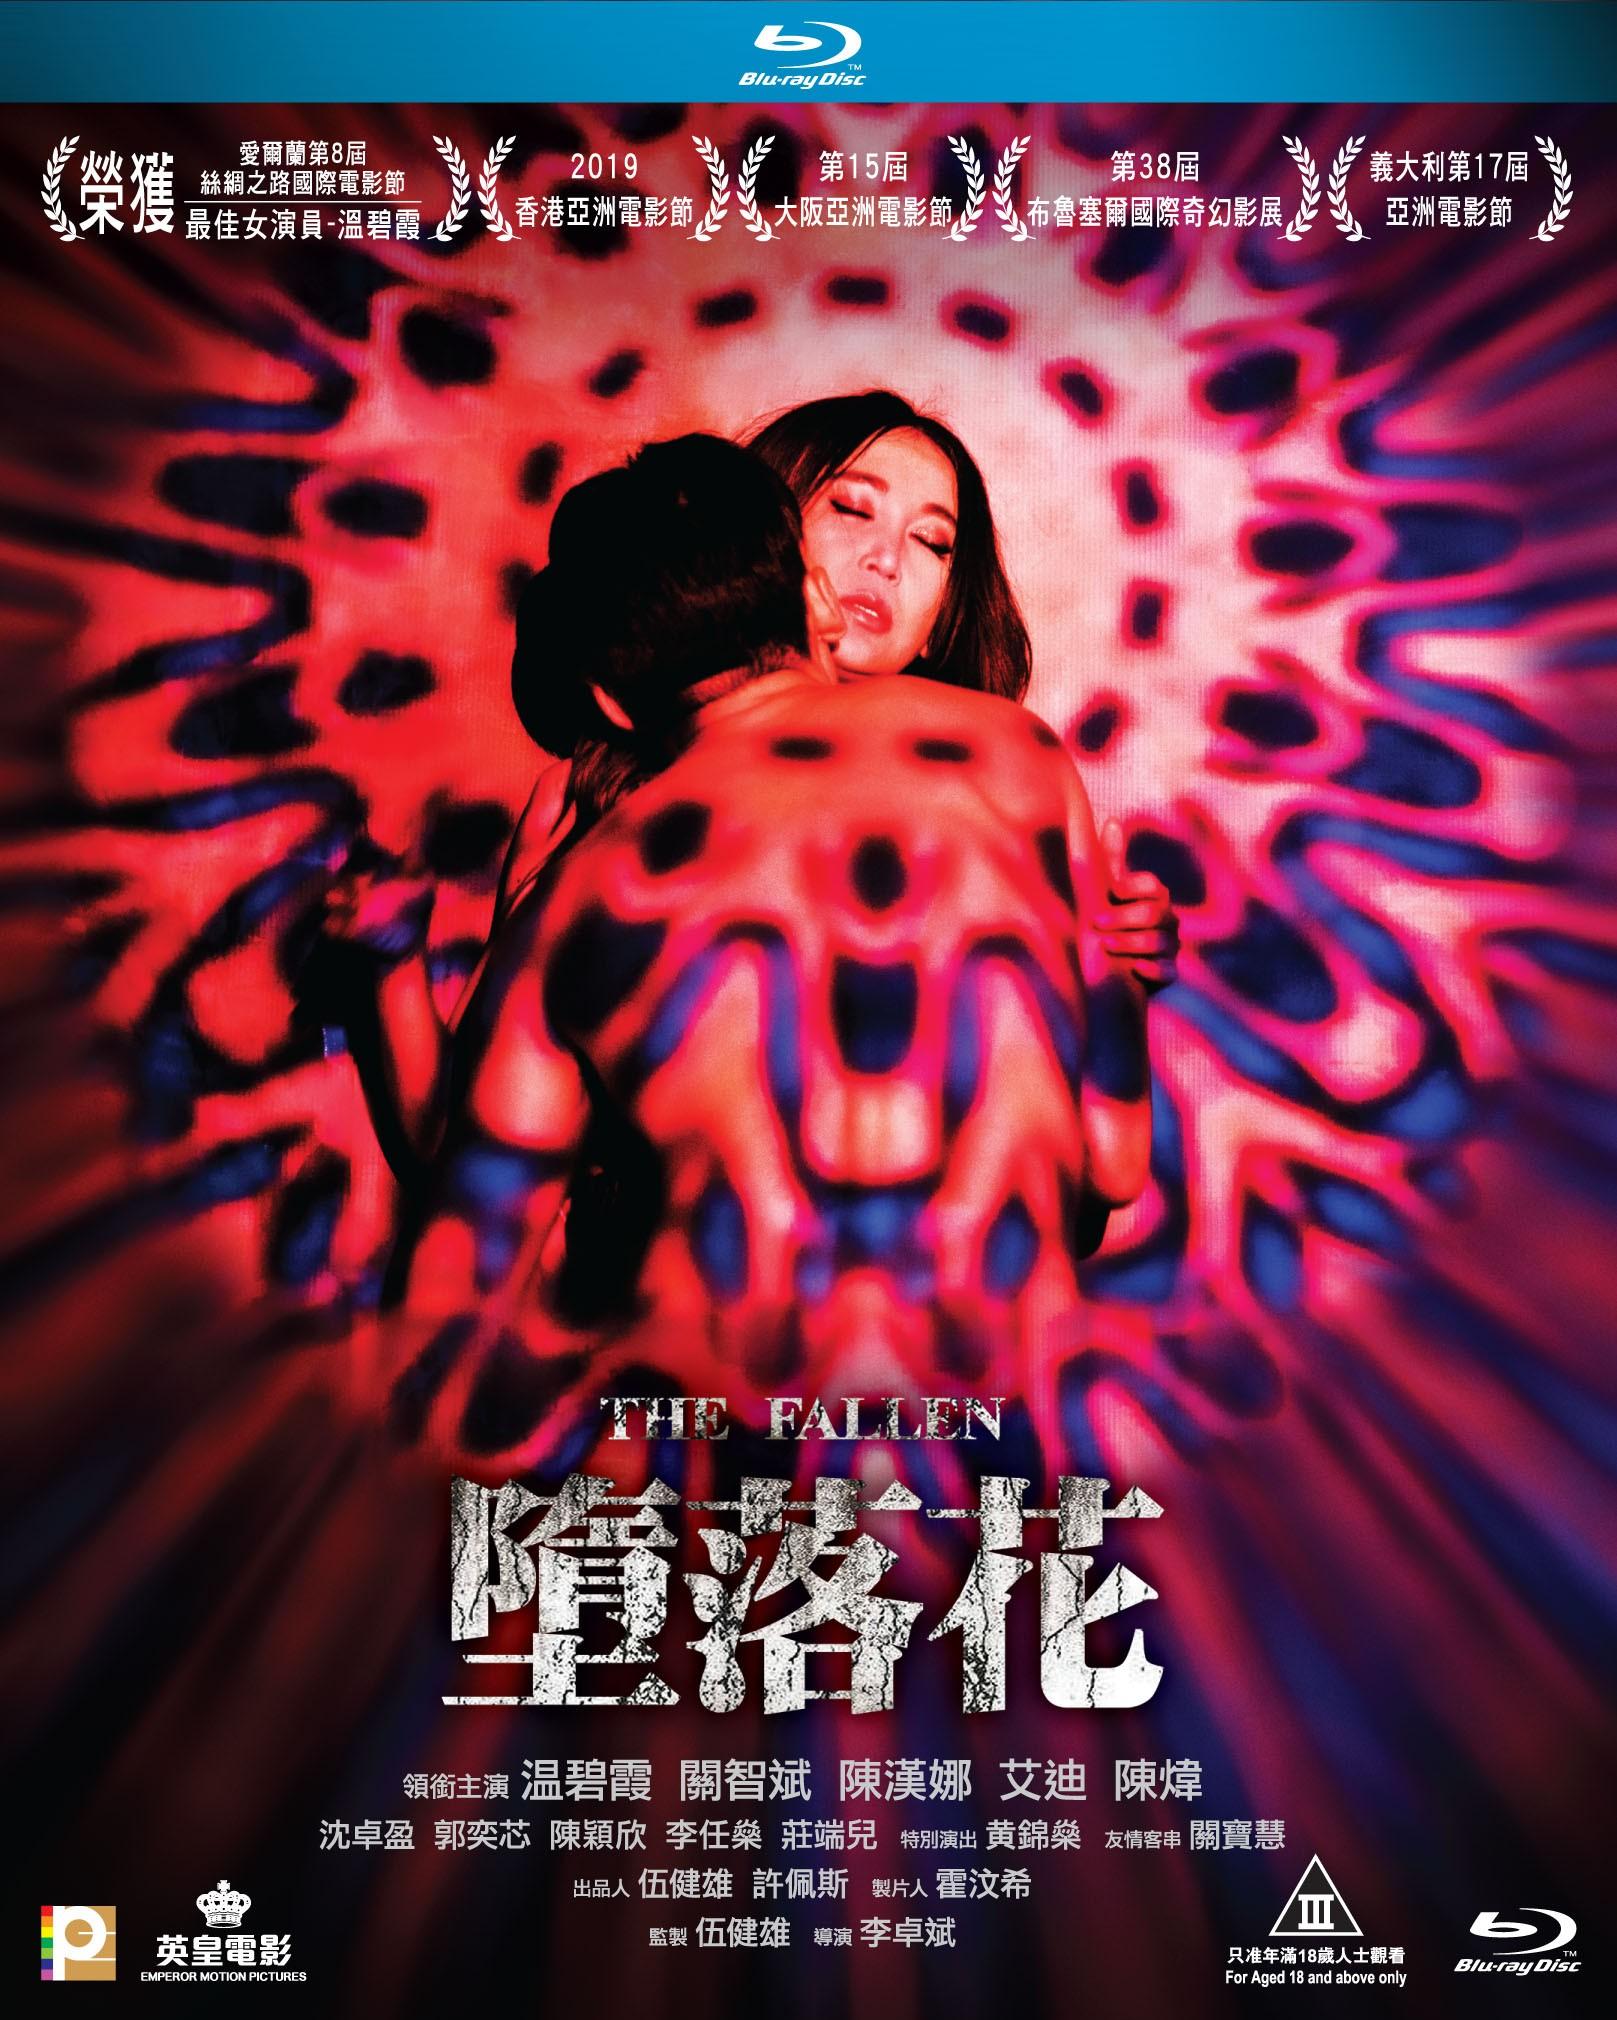 https://shop.panorama.com.hk/hk/drama/3554--.html